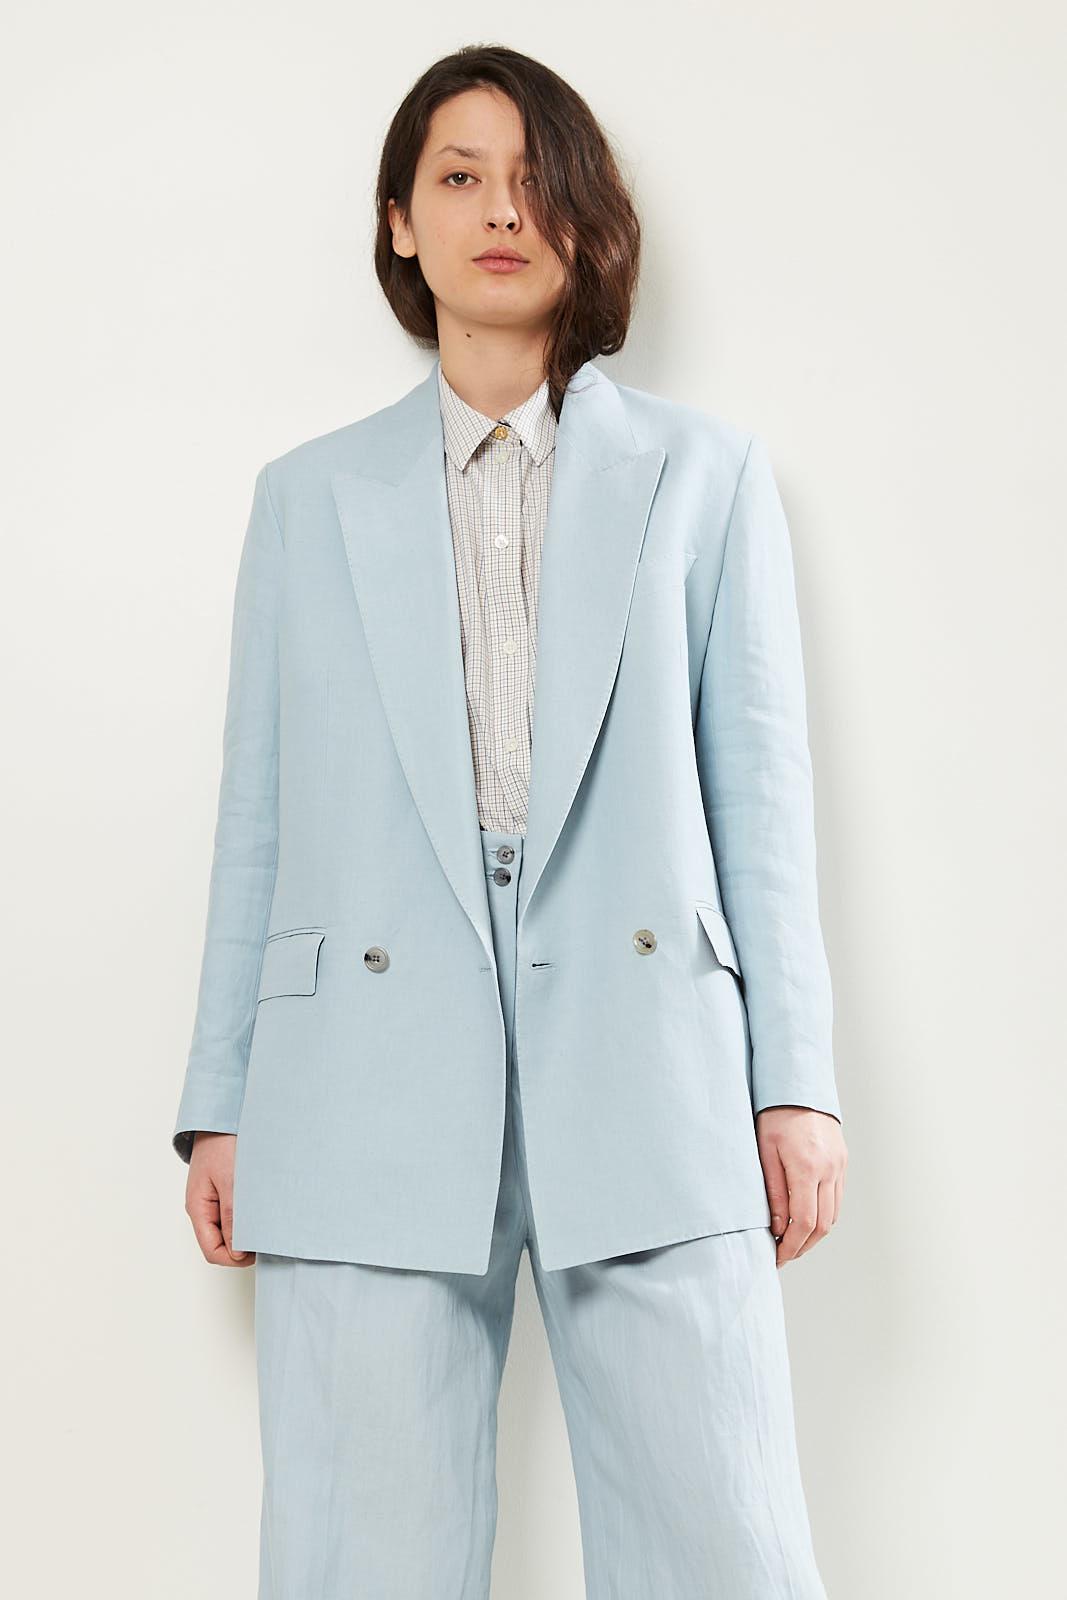 Paul Smith womens jacket